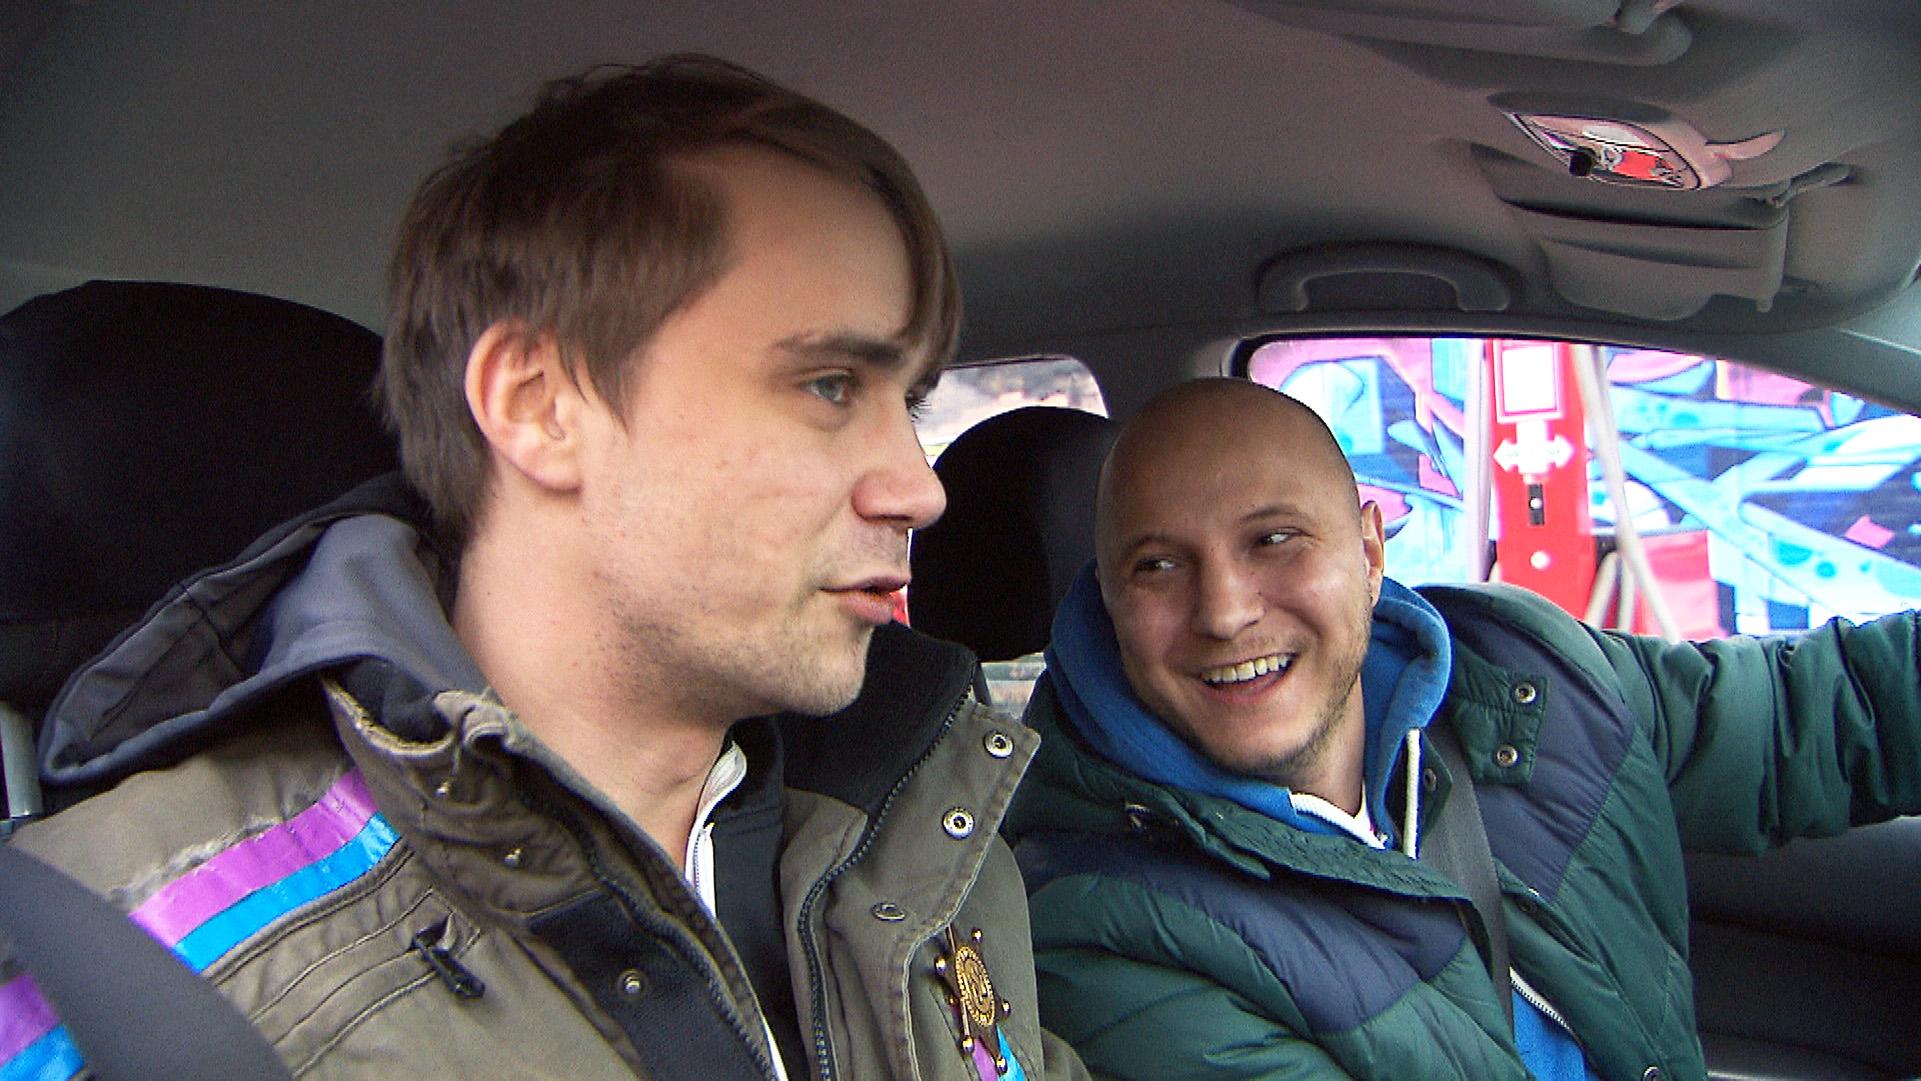 Krätze (re.) und Schmidti (li.) beschließen, den ersten April gebührend zu feiern... (Quelle: RTL 2)